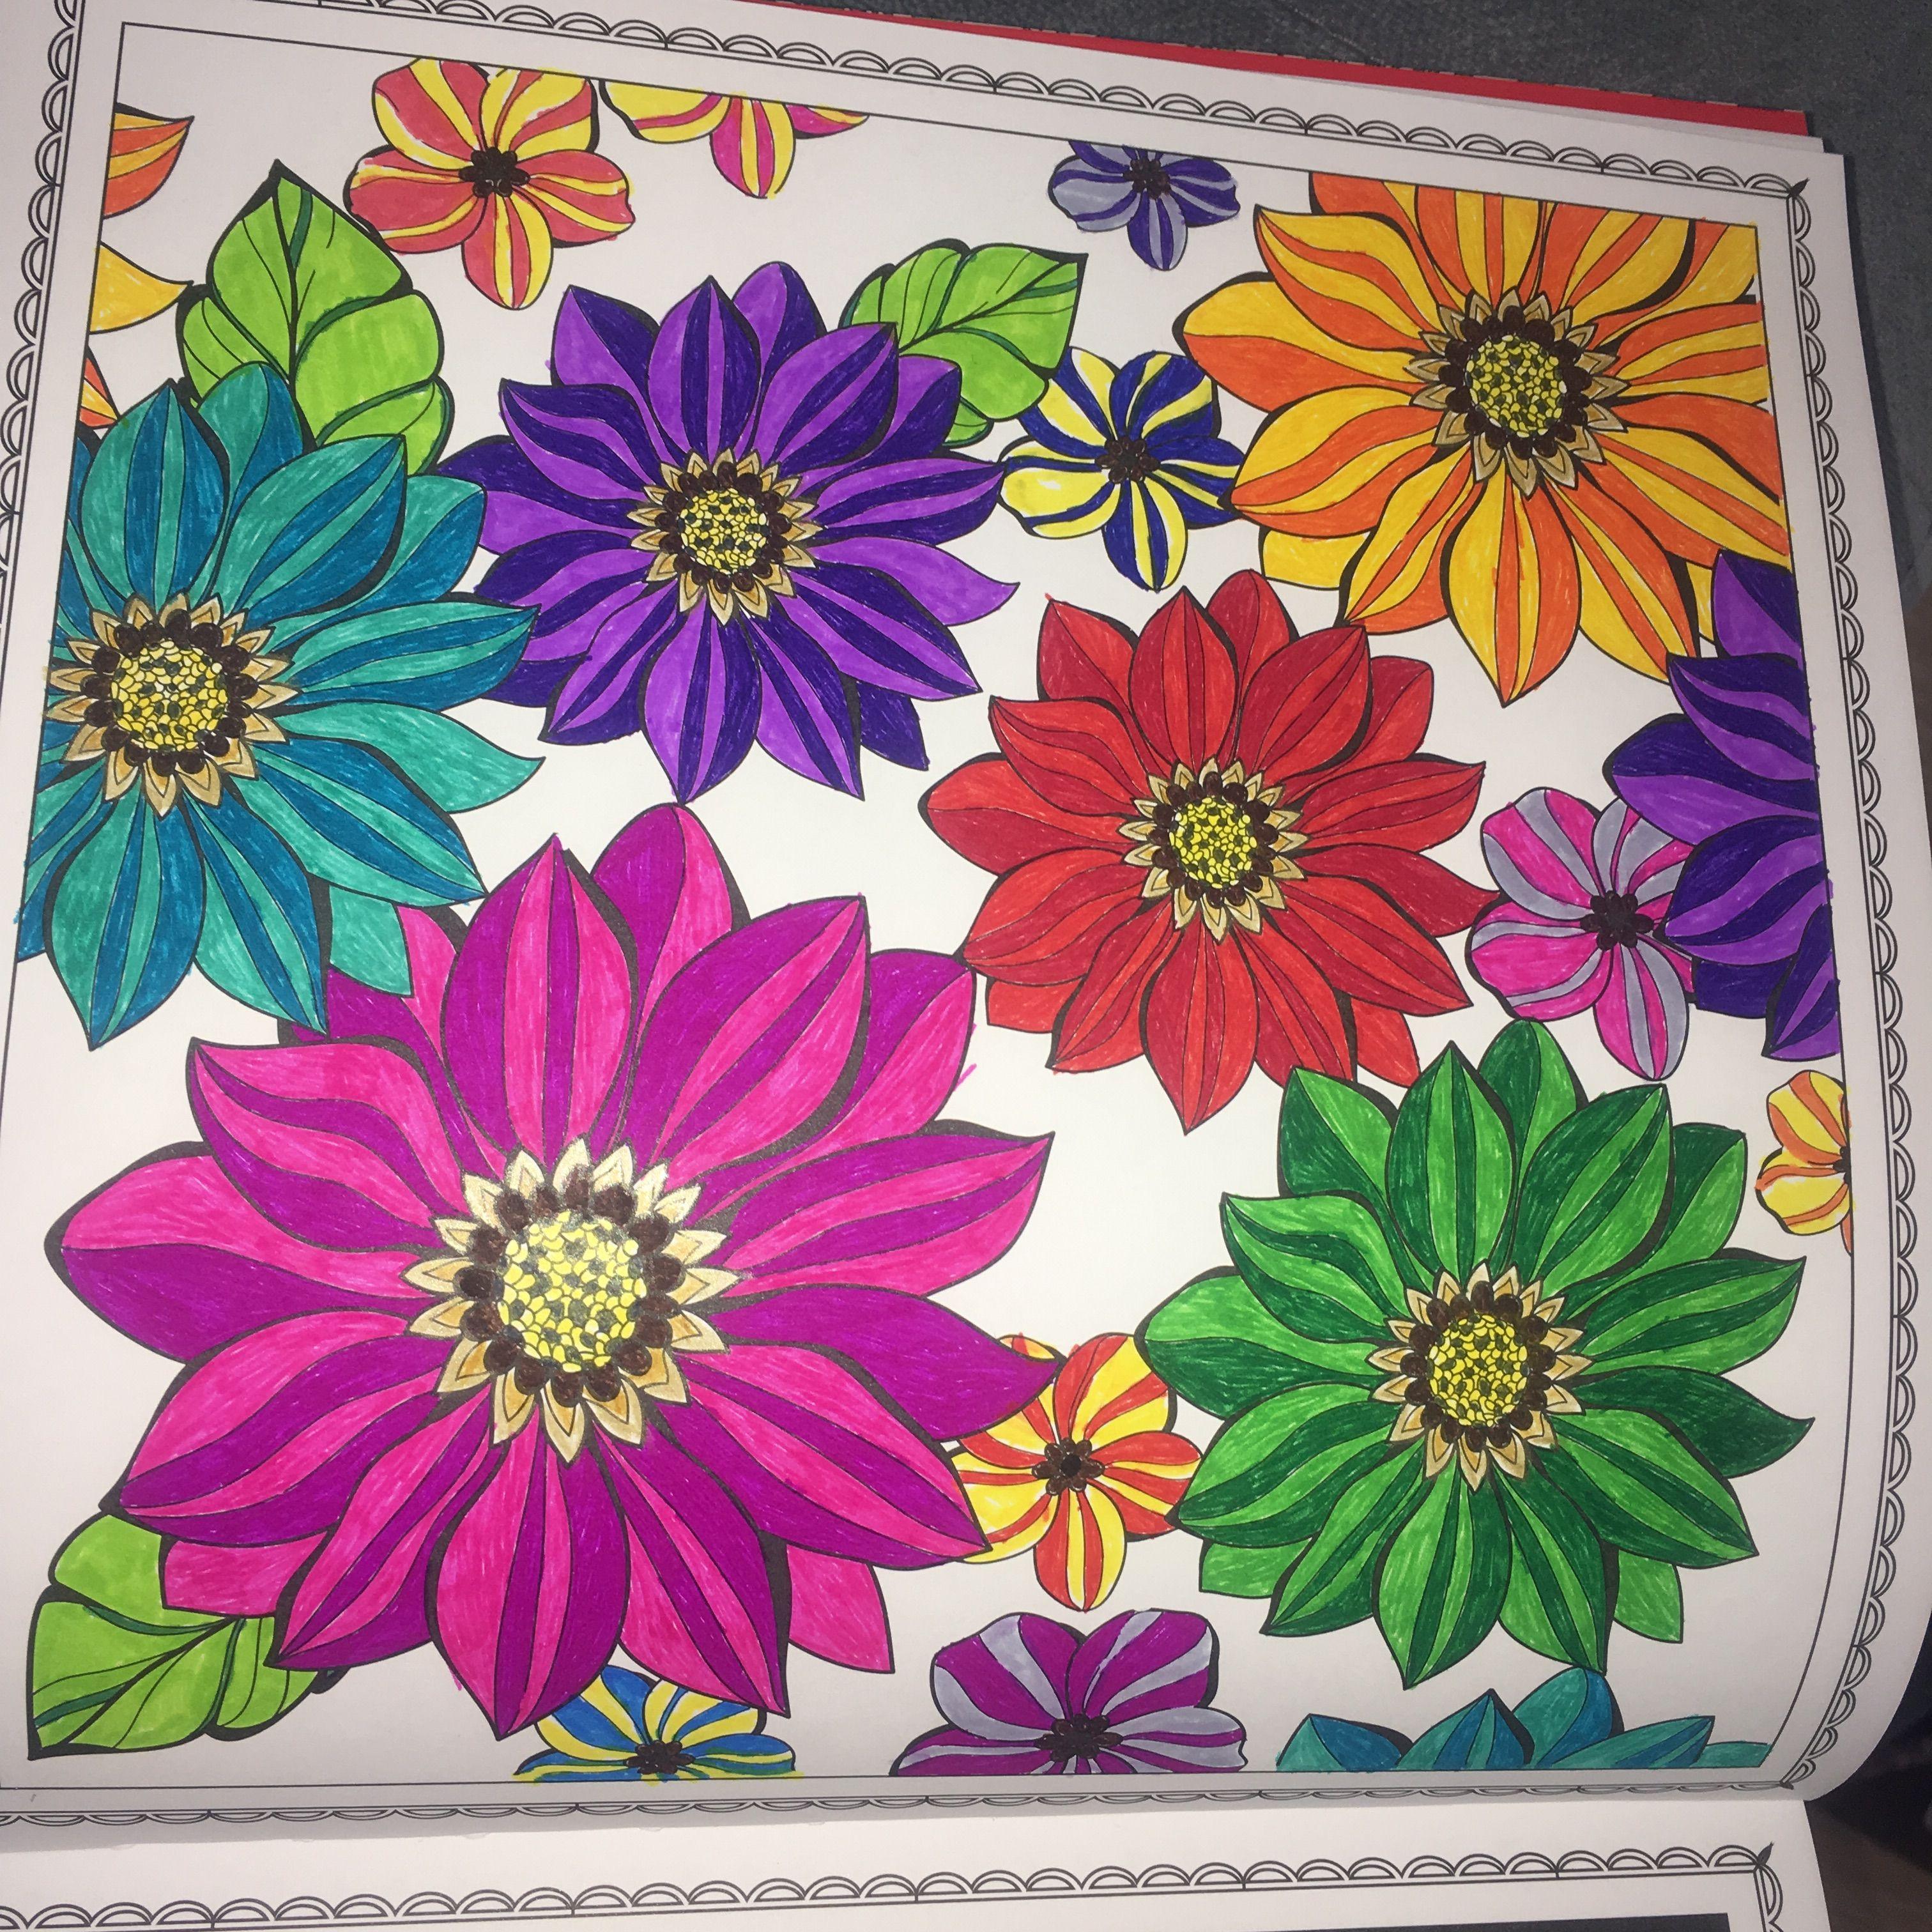 Kreative auszeit stabilo mandala art flower | Mandala | Pinterest ...